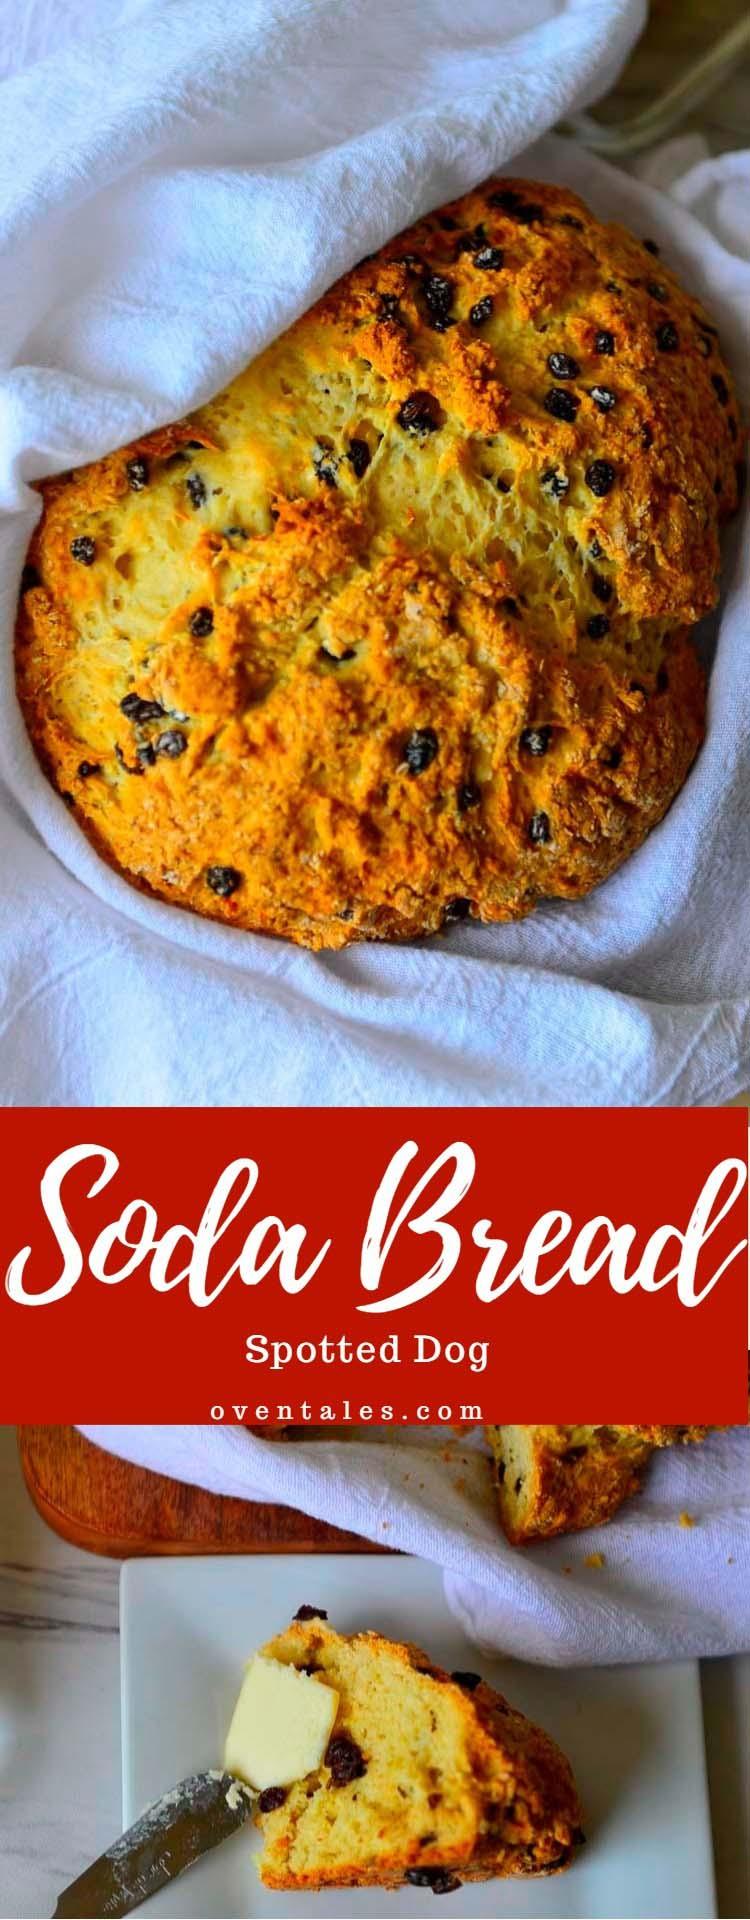 Spotted Dog - Irish Soda bread